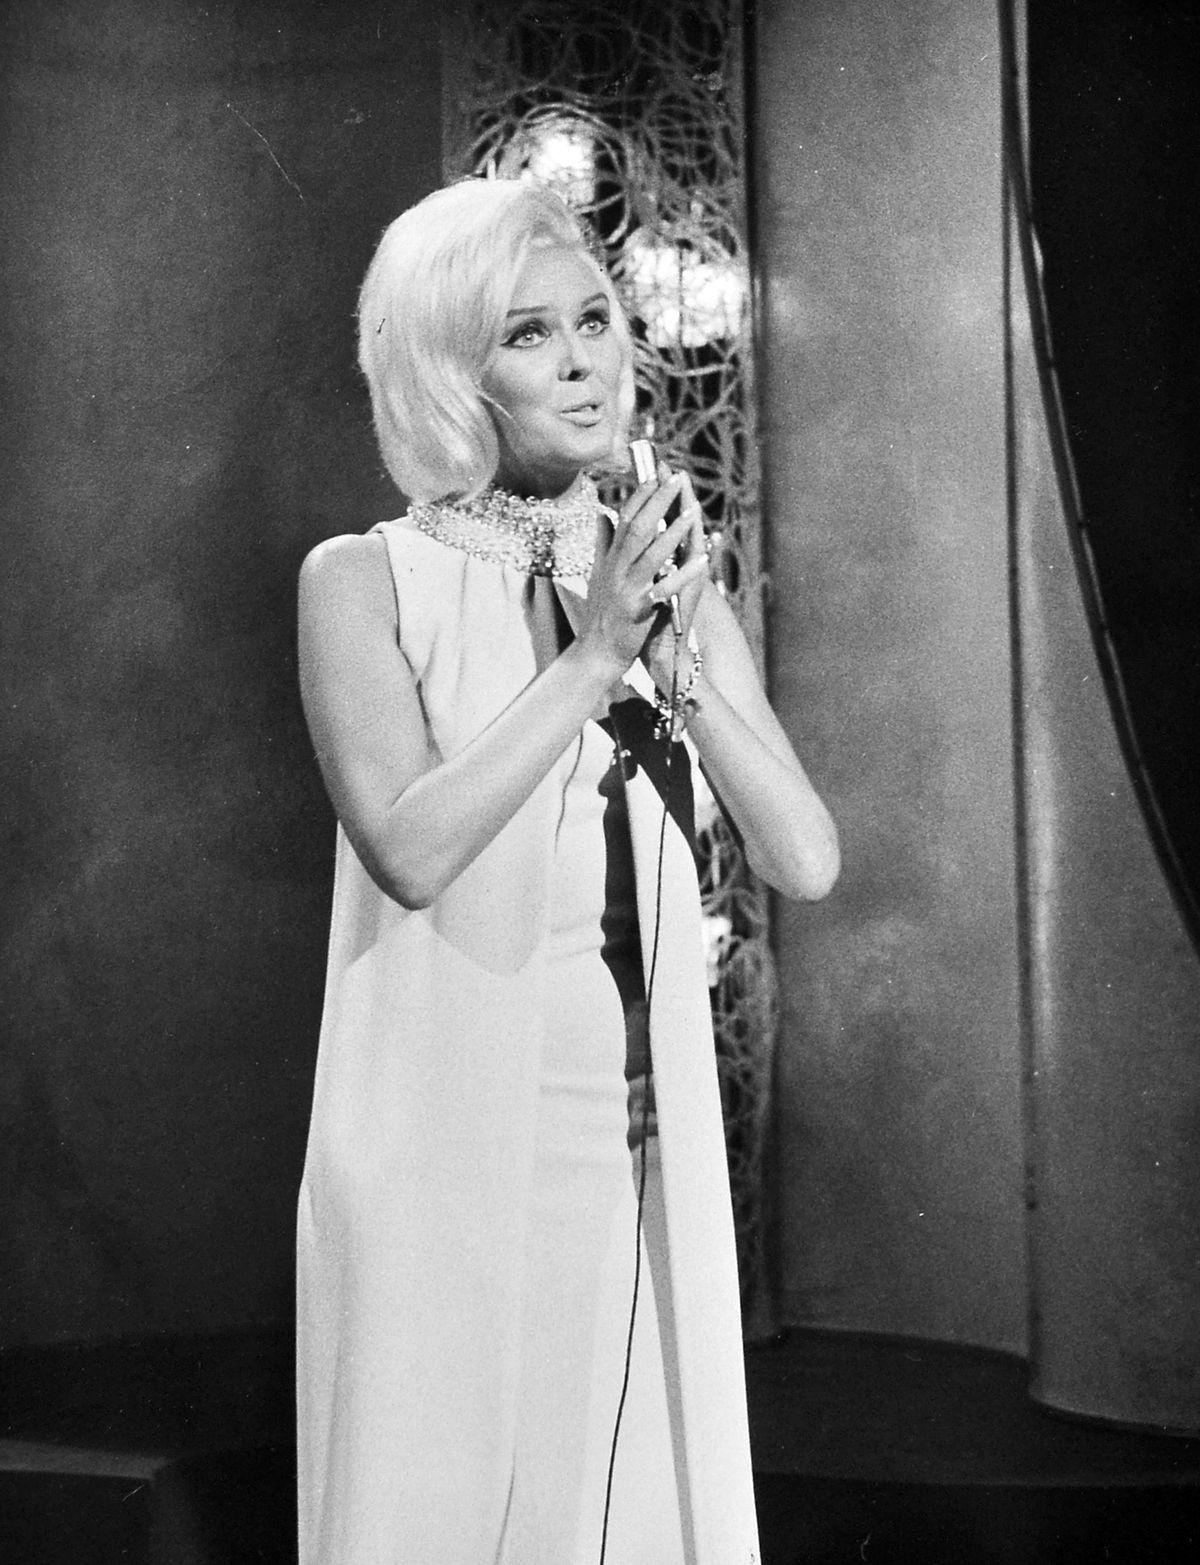 Broseley-born singing star of the 1960s Janie Marden.